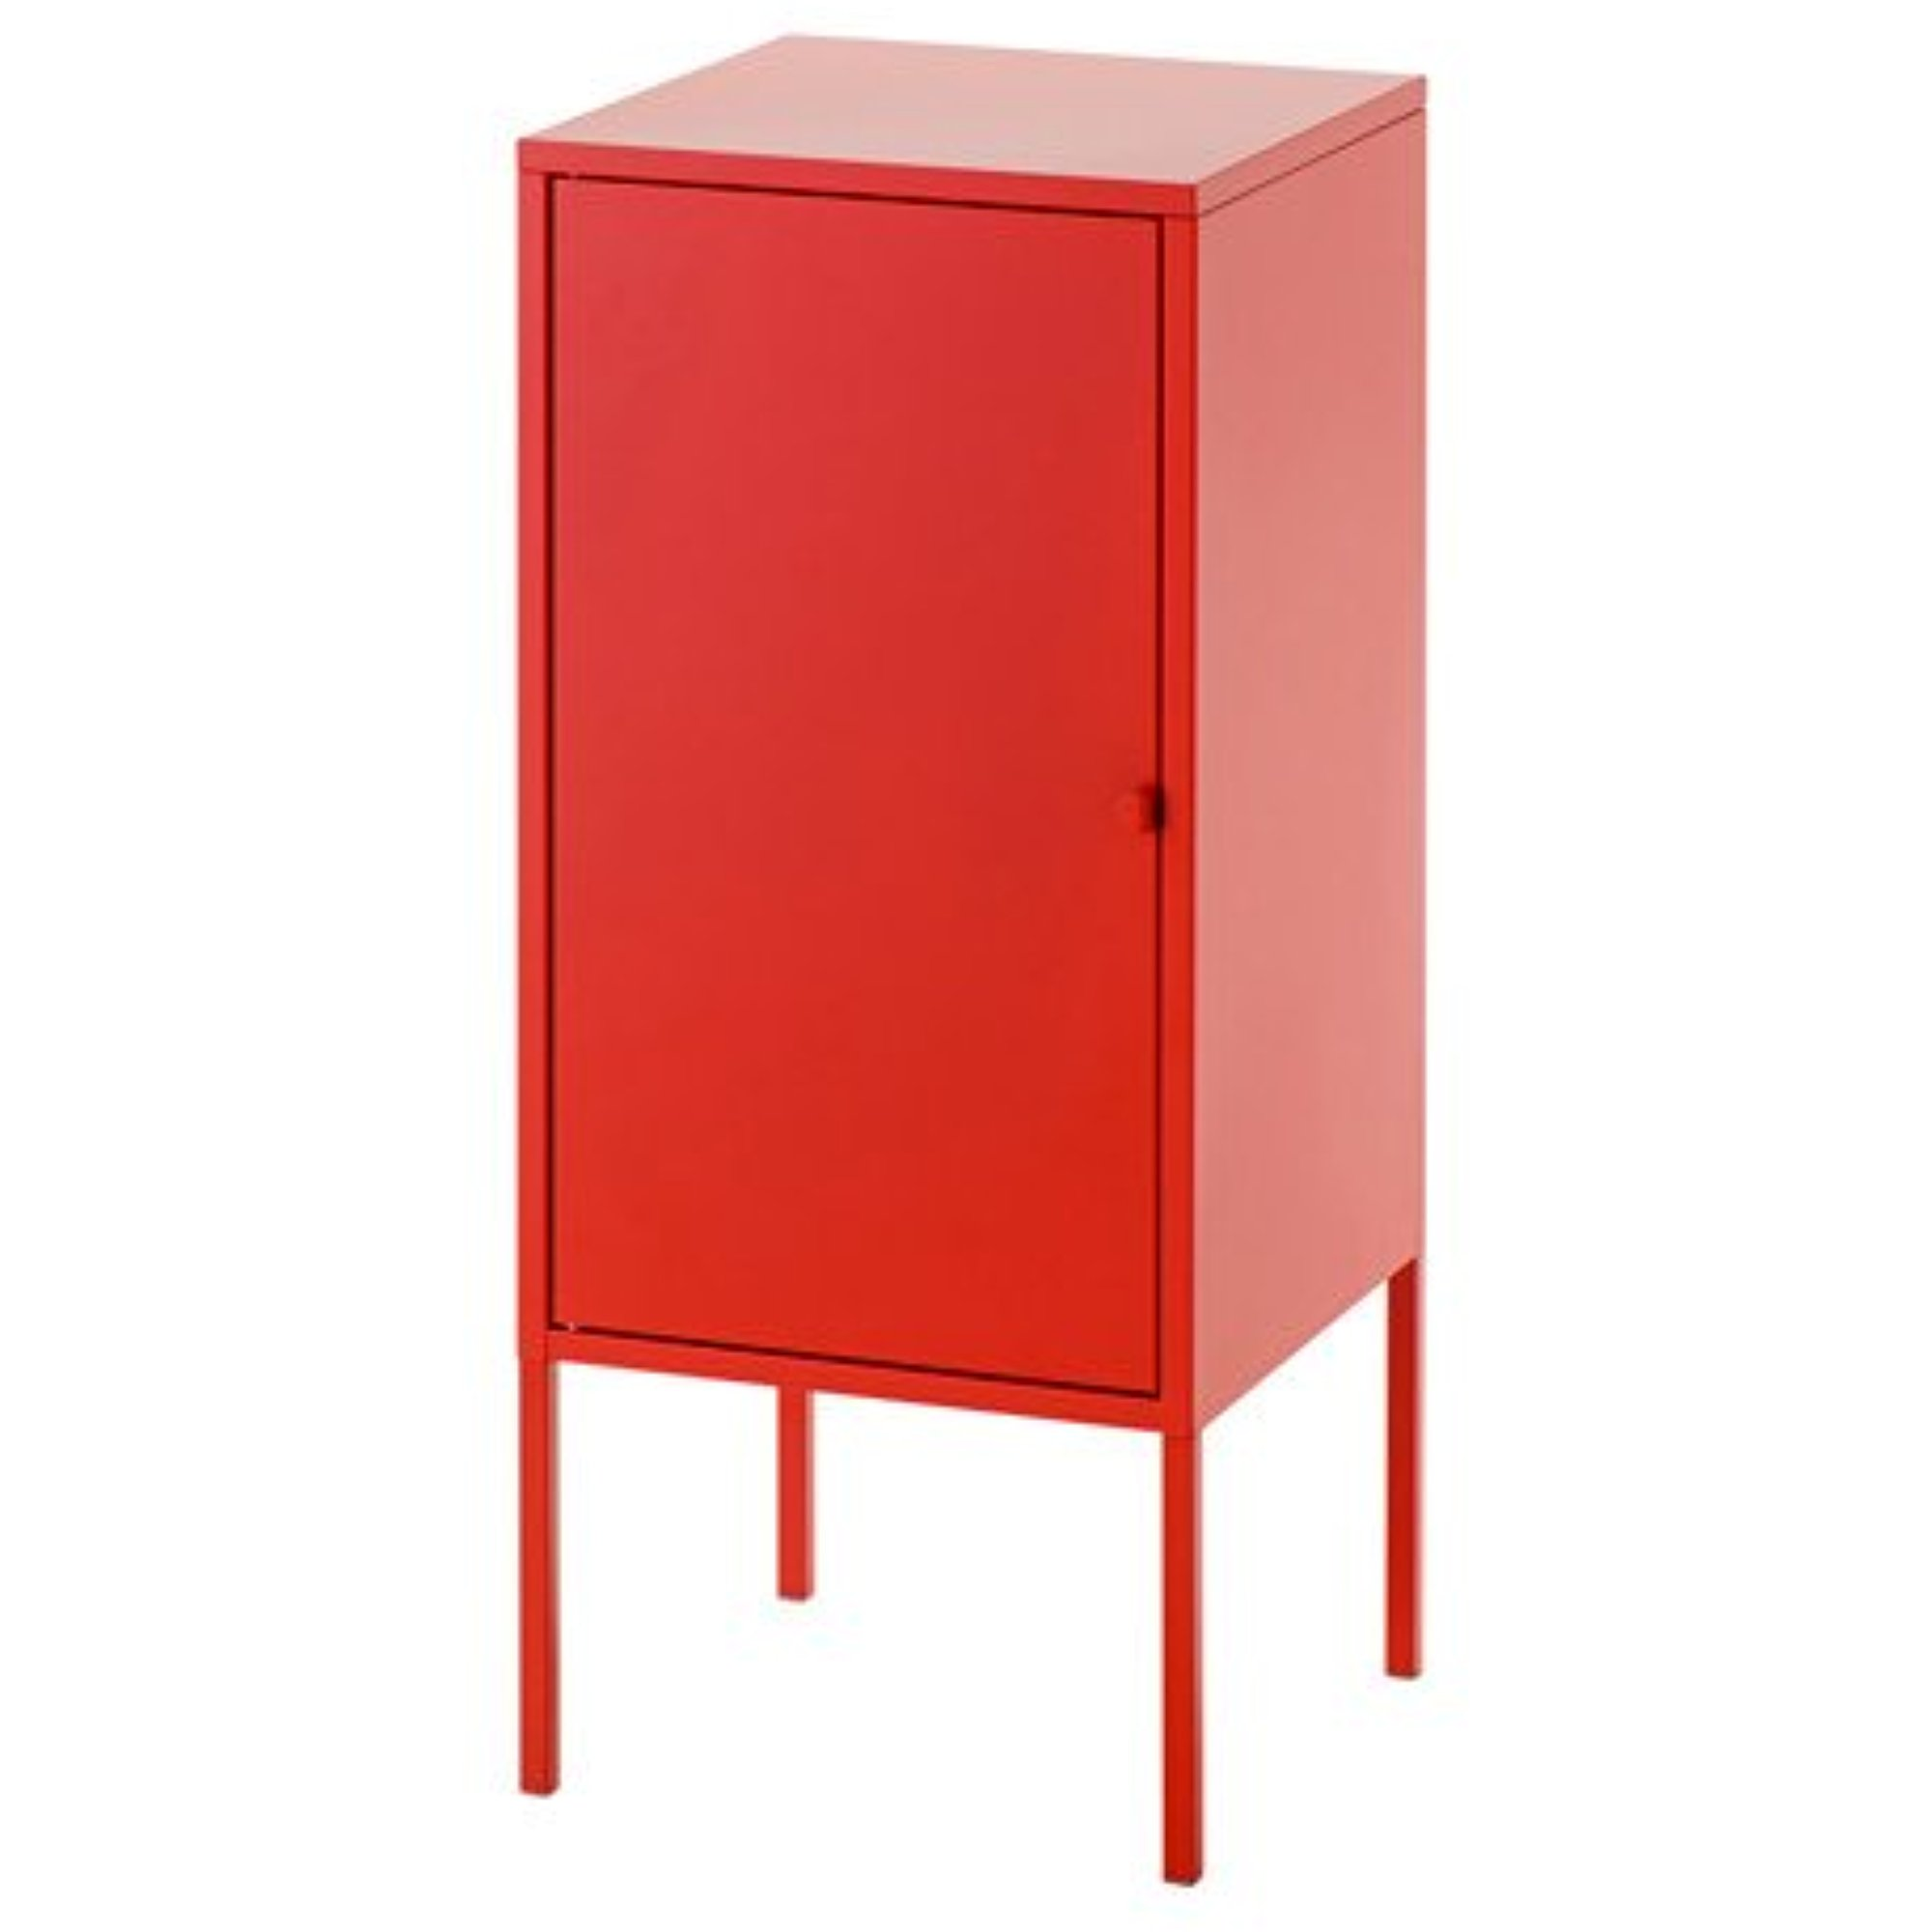 Ikea Storage Cabinet, Metal, Red 1228.82620.302